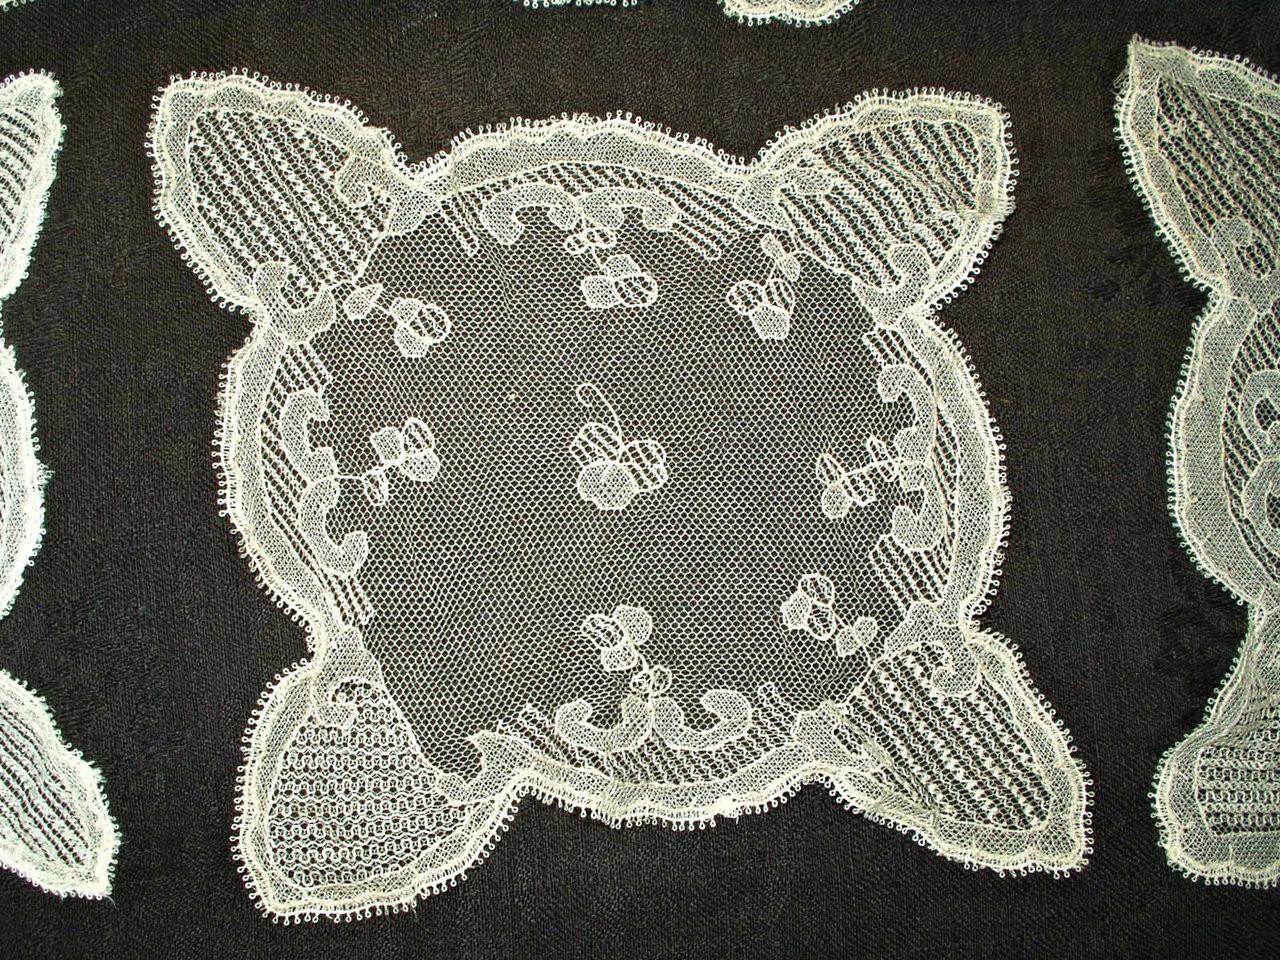 5 Antique Victorian Edwrdian Hand Irish Carrickmacross Needle Run Lace Doily Doilies